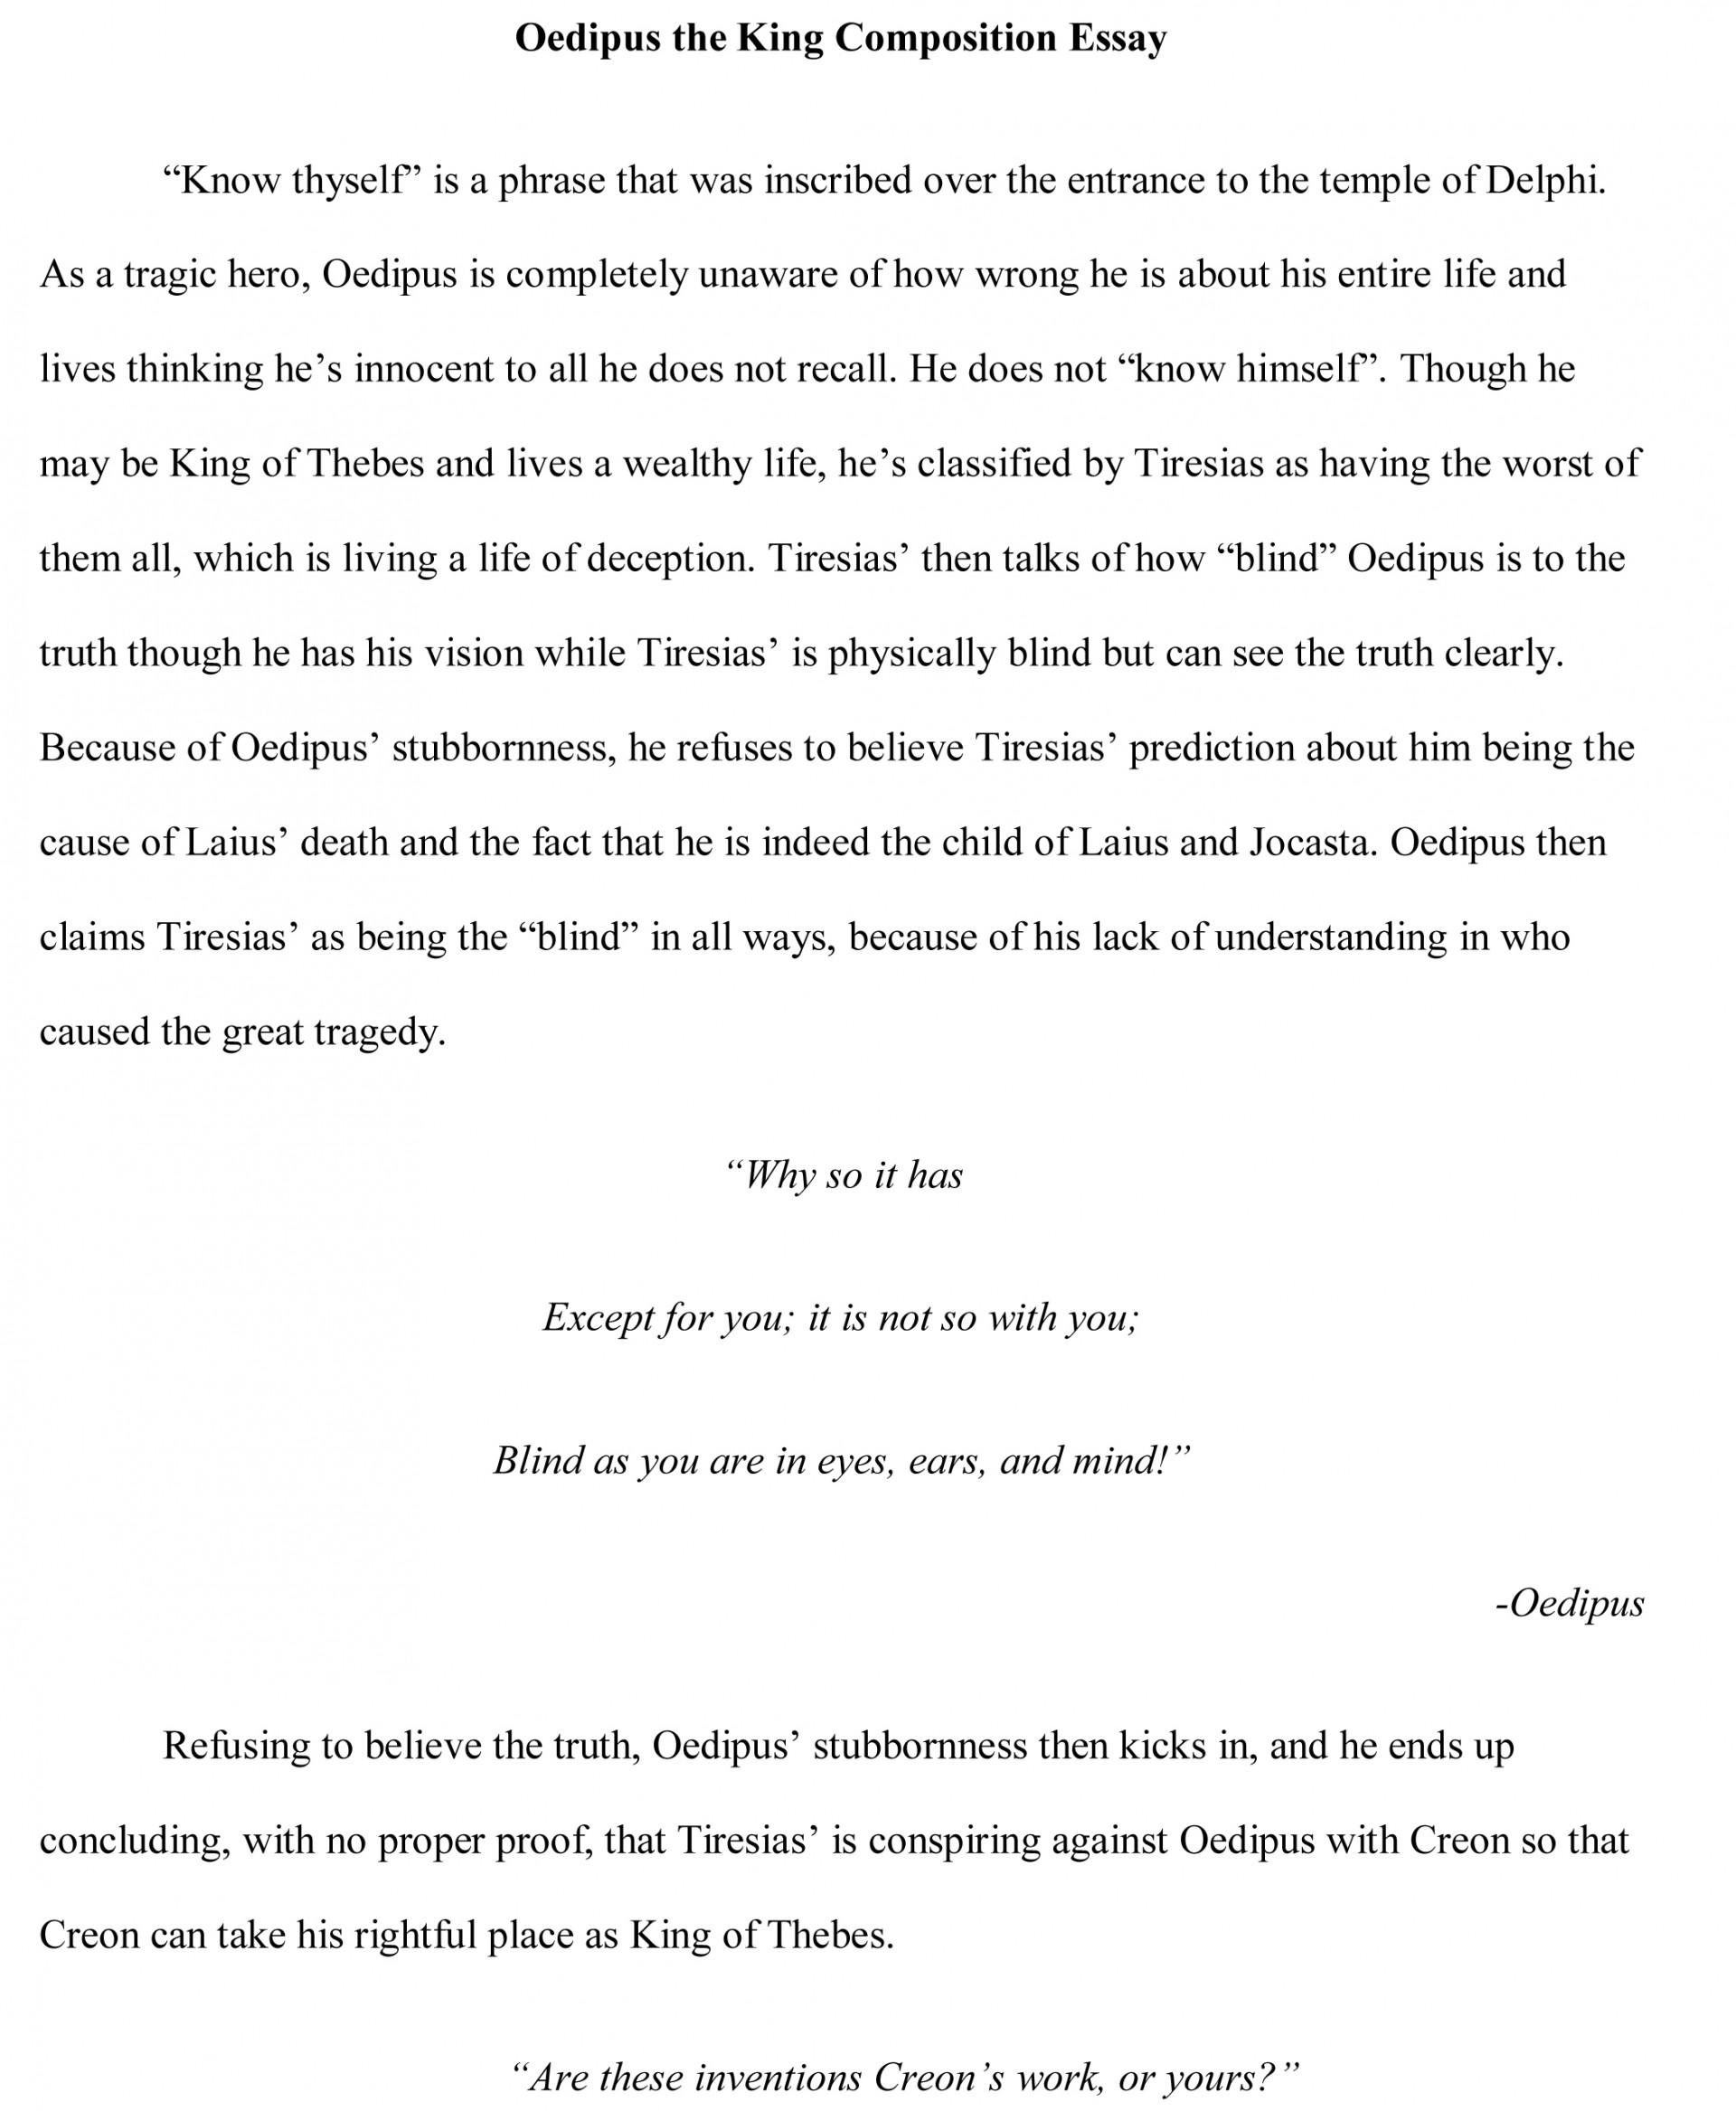 019 Macbeth Tragic Hero Essay Oedipus Free Sample Stunning Introduction Conclusion Pdf 1920